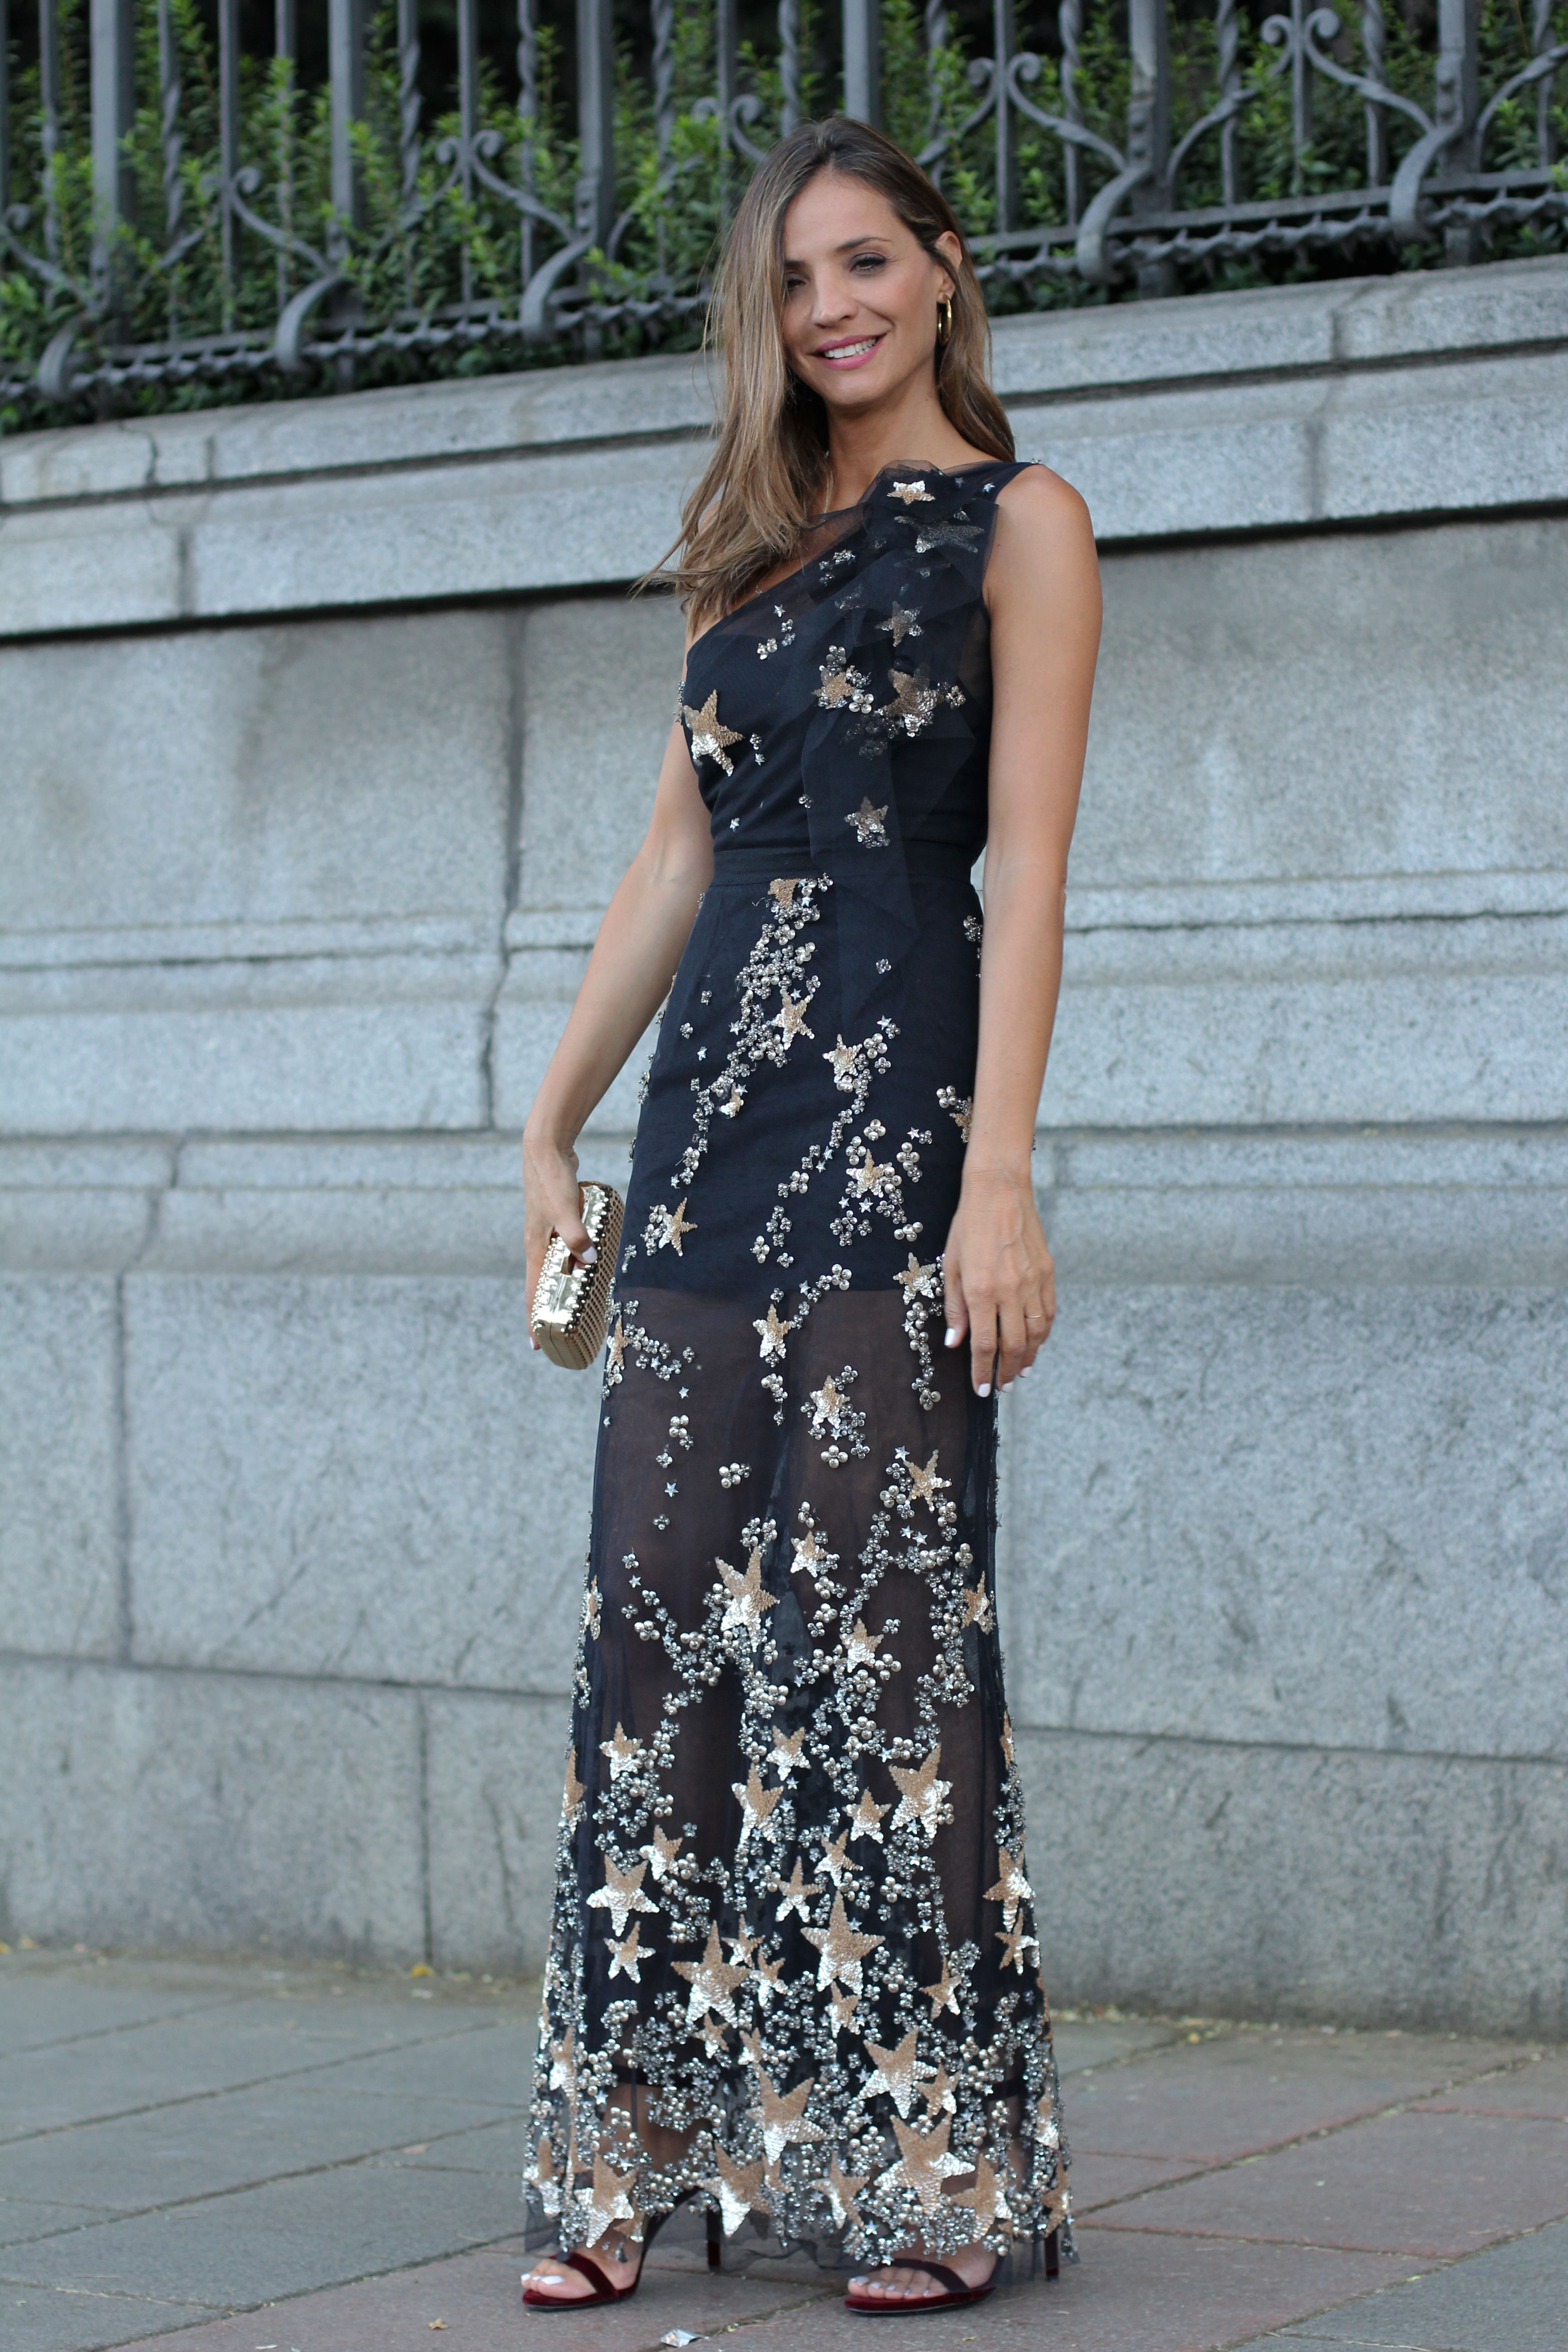 star dress contacto - Lady Addict | Get Dressed | Pinterest ...